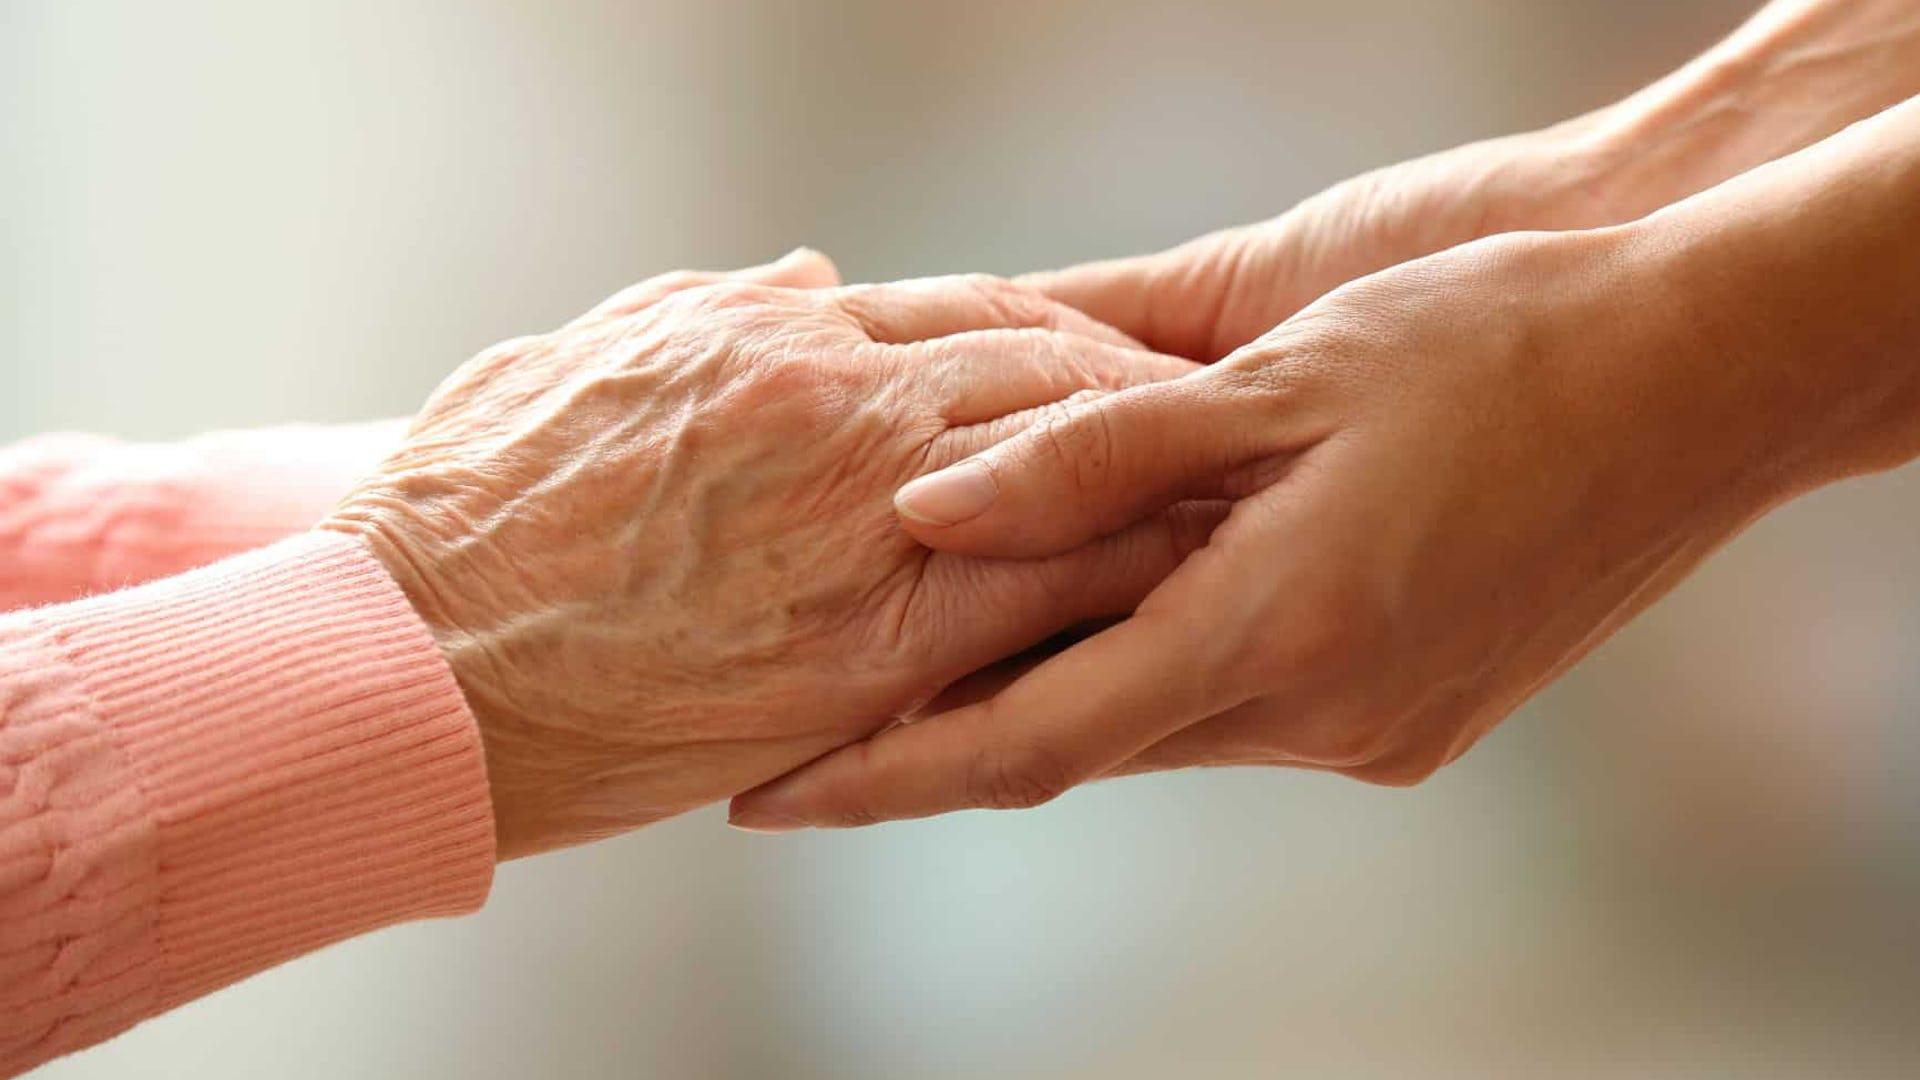 Elderly Lady and Carer Holding Hands